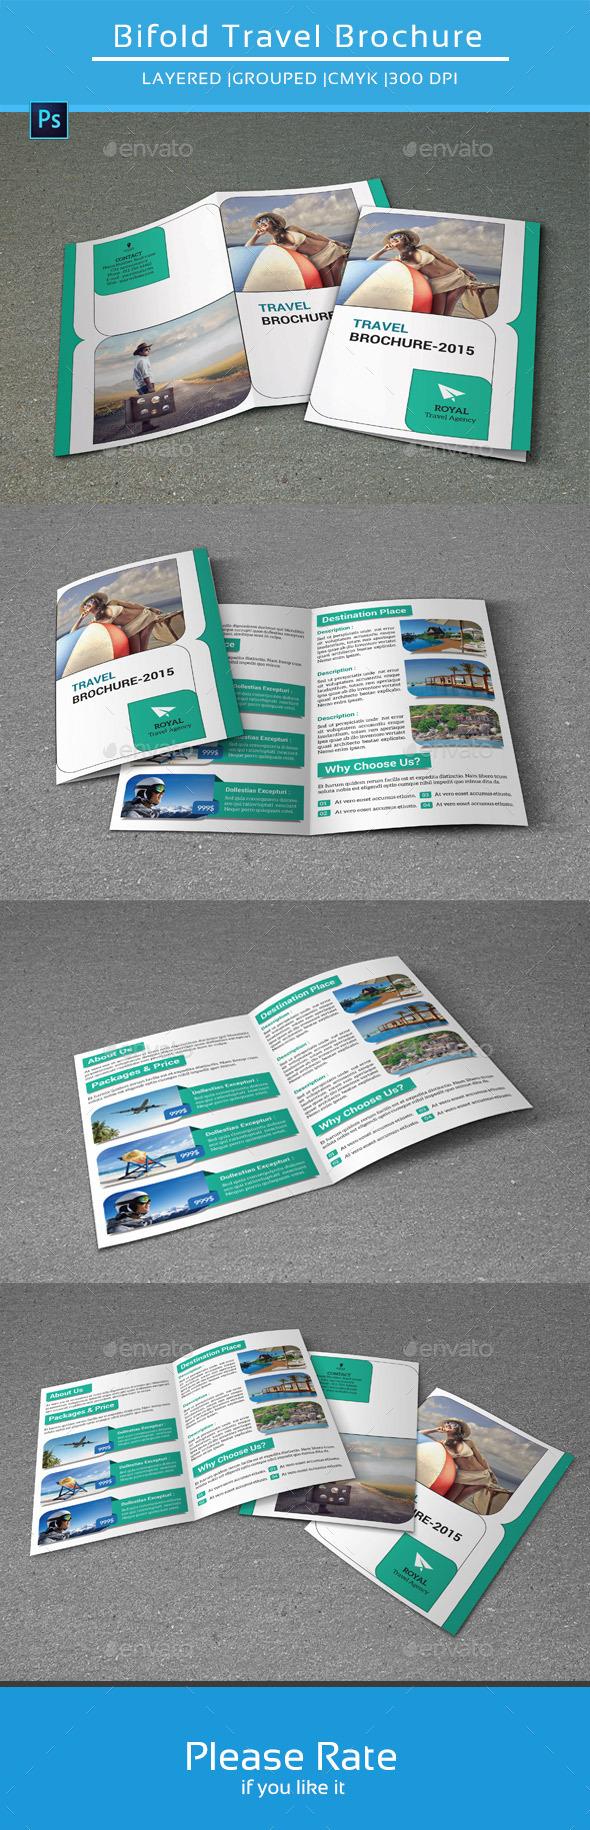 GraphicRiver Bifold Brochure for Travel-V136 8882322